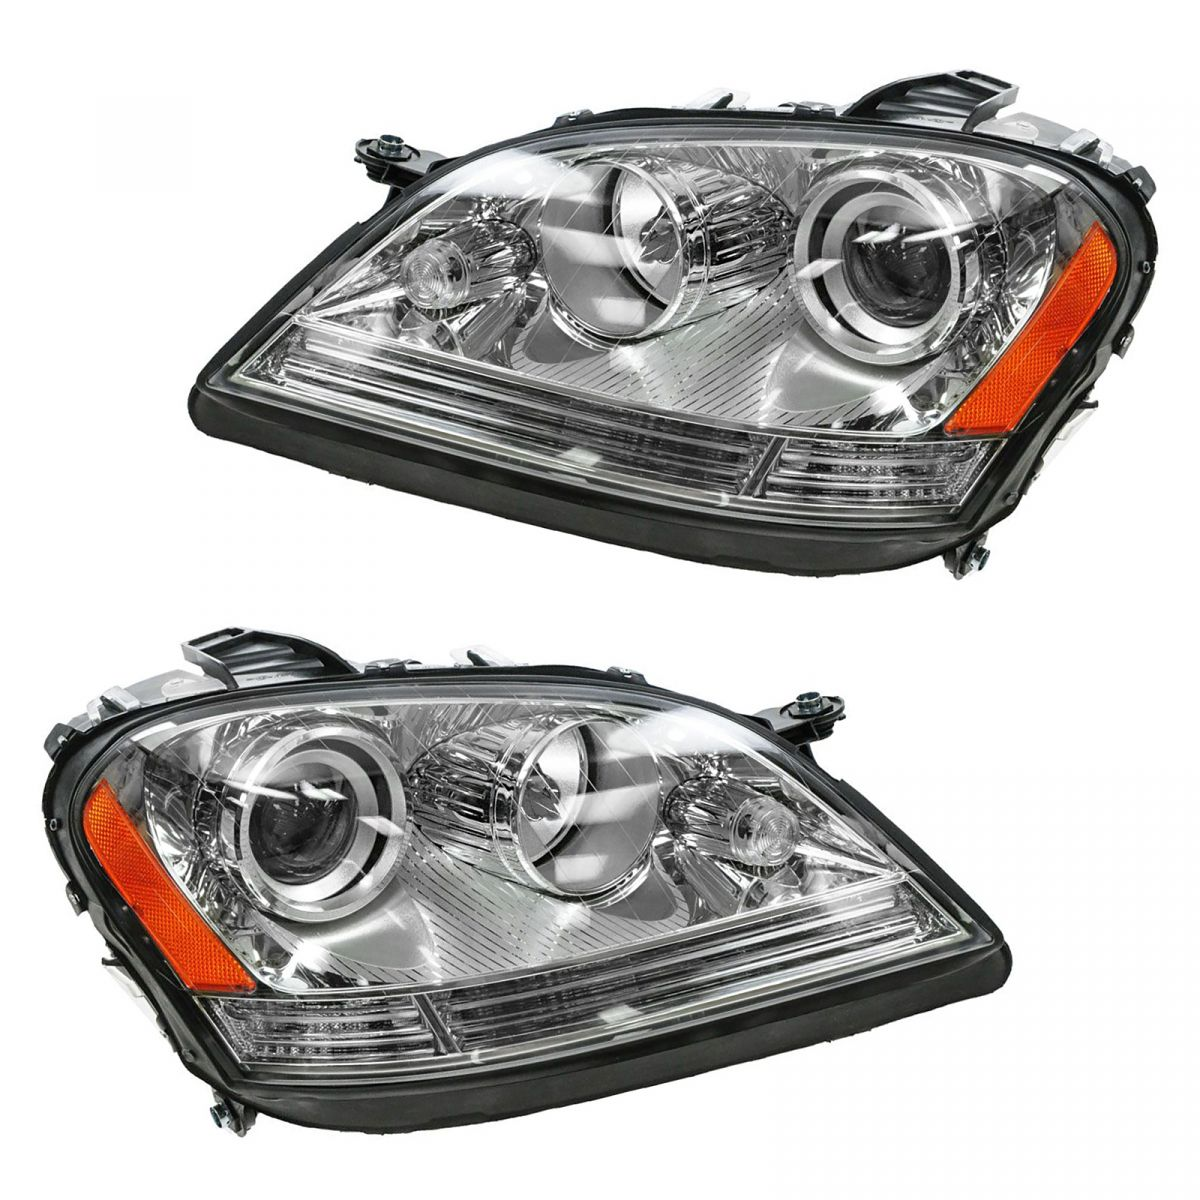 Mercedes Benz Headlight Bulb Replacement Instructions